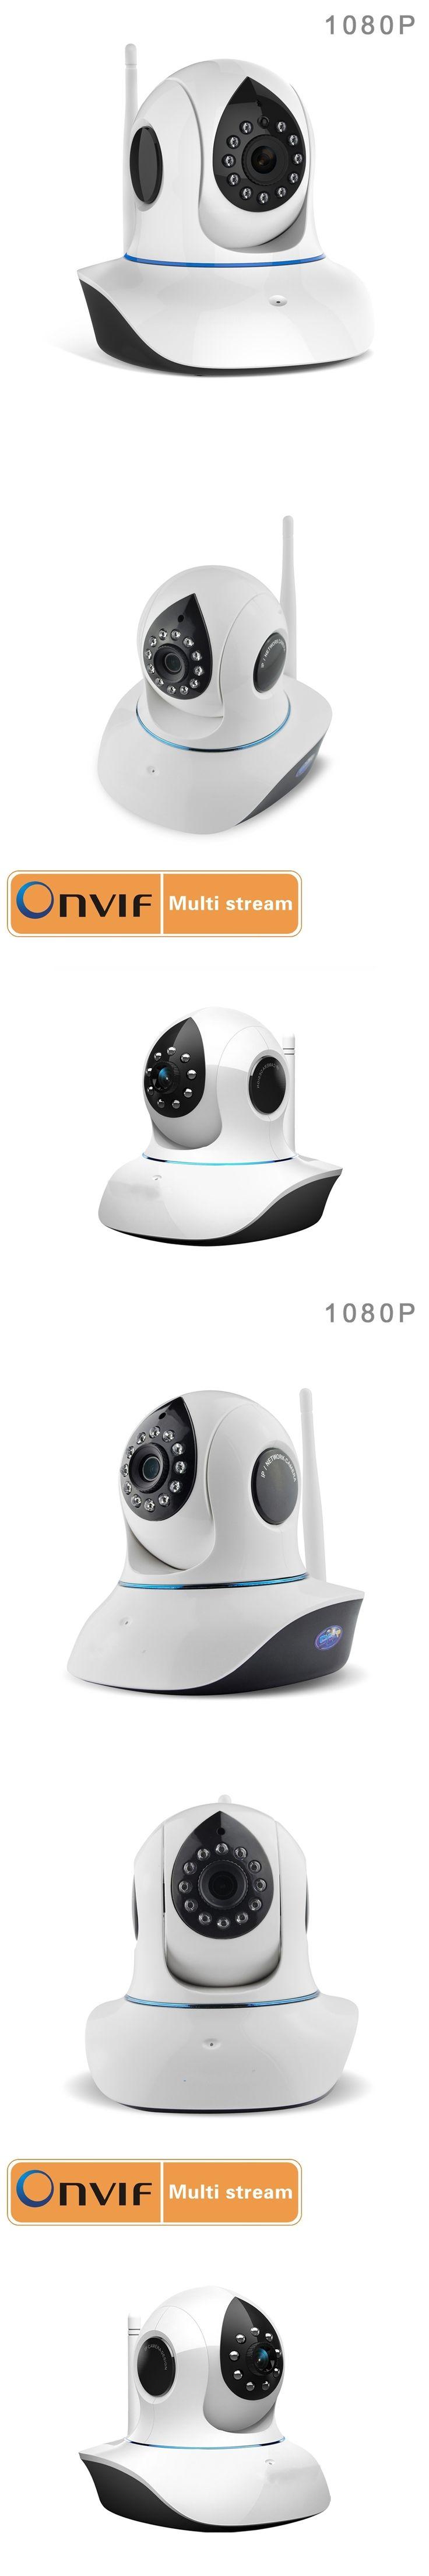 1080P HD WIFI PTZ IP Camera with ONVIF 2.4 Protocol, High Interoperability,1/3inch 1080p Progressive Scan CMOS Sensor& Free App